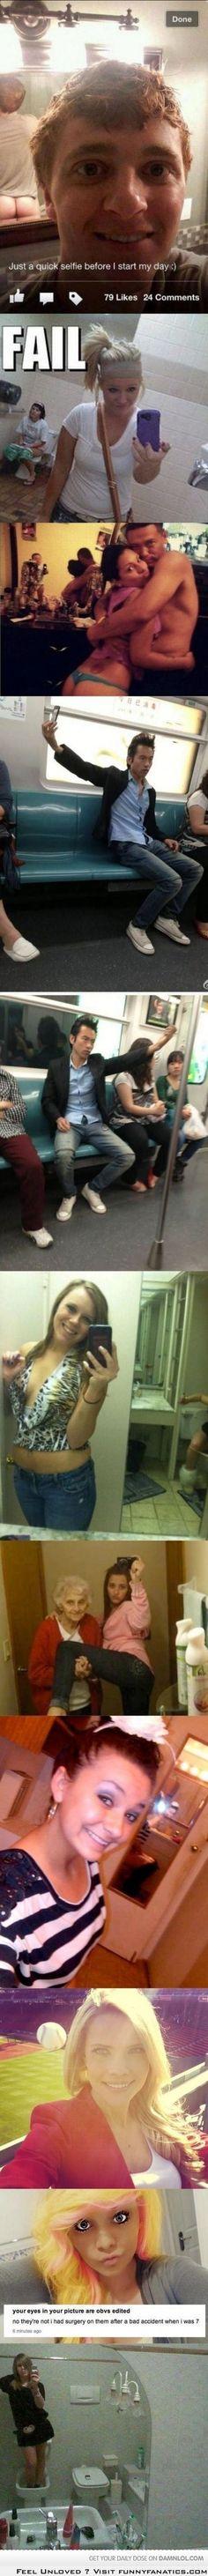 Pictures That Shouldn't Been Taken